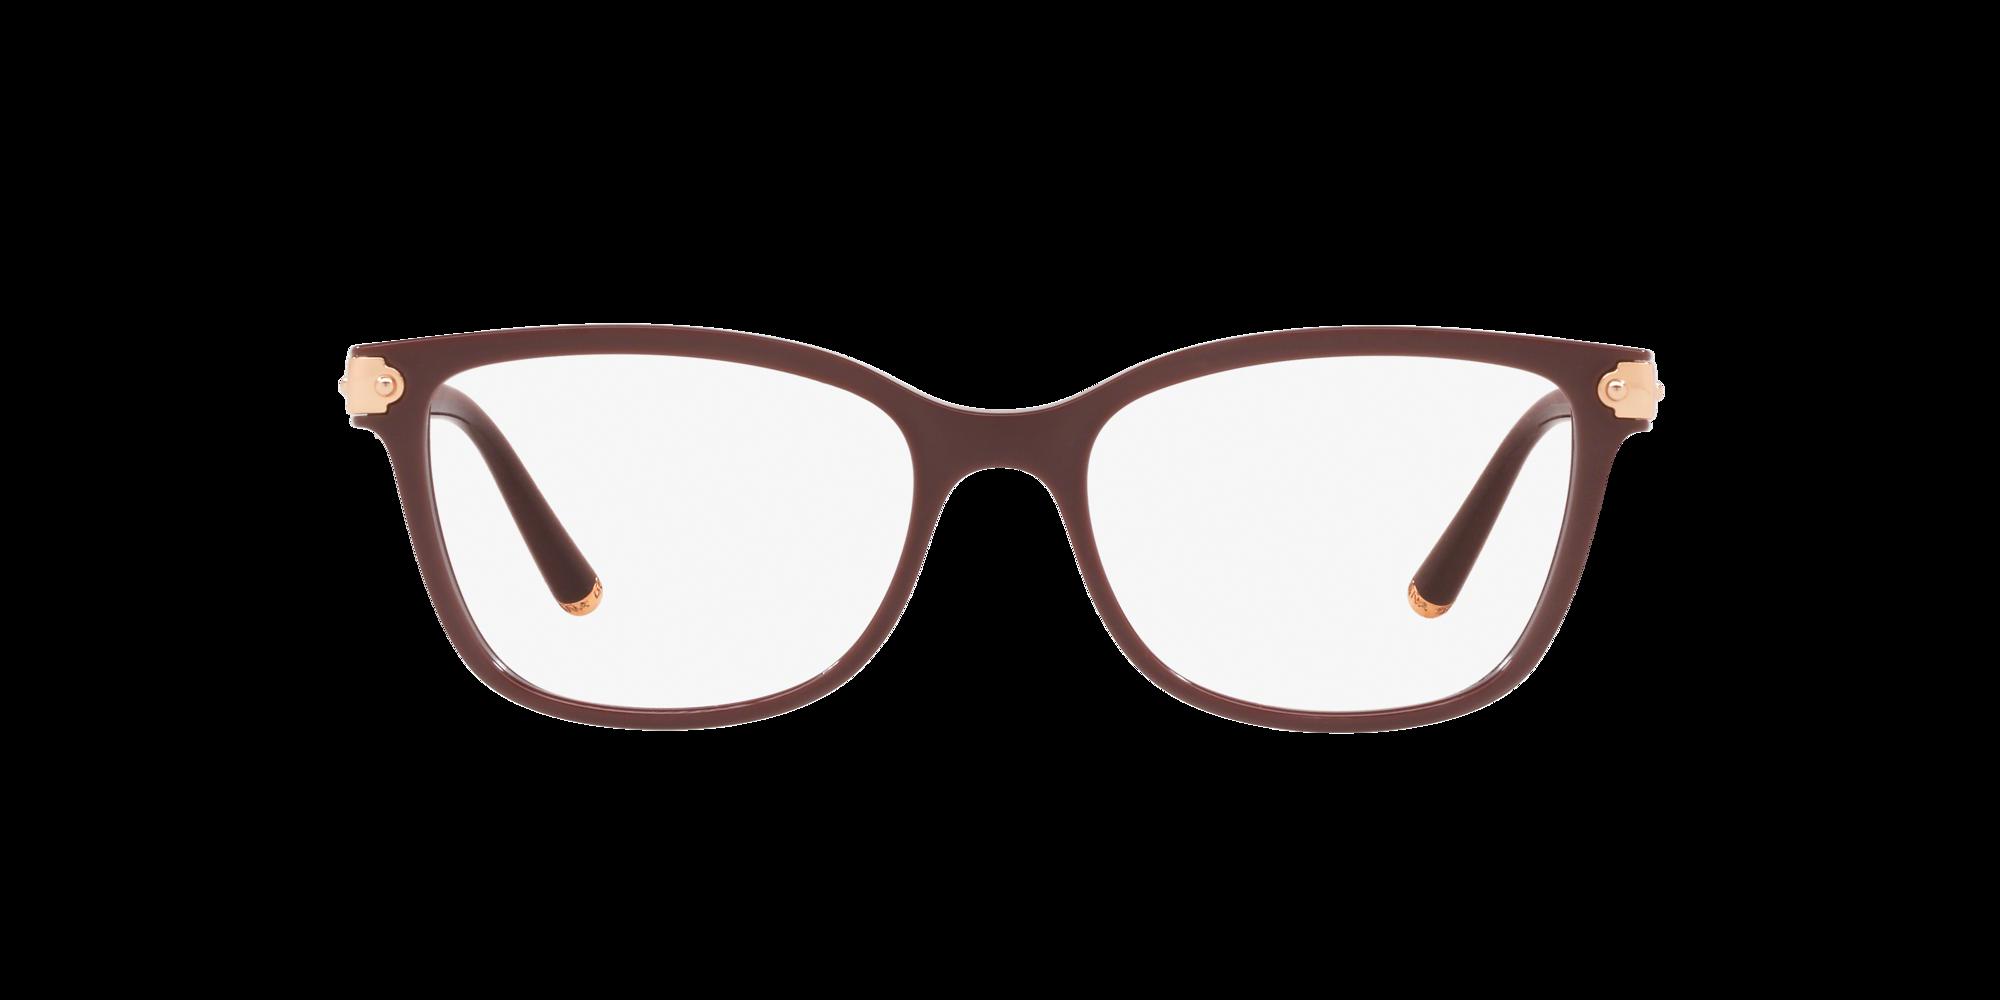 Image for DG5036 from LensCrafters   Glasses, Prescription Glasses Online, Eyewear